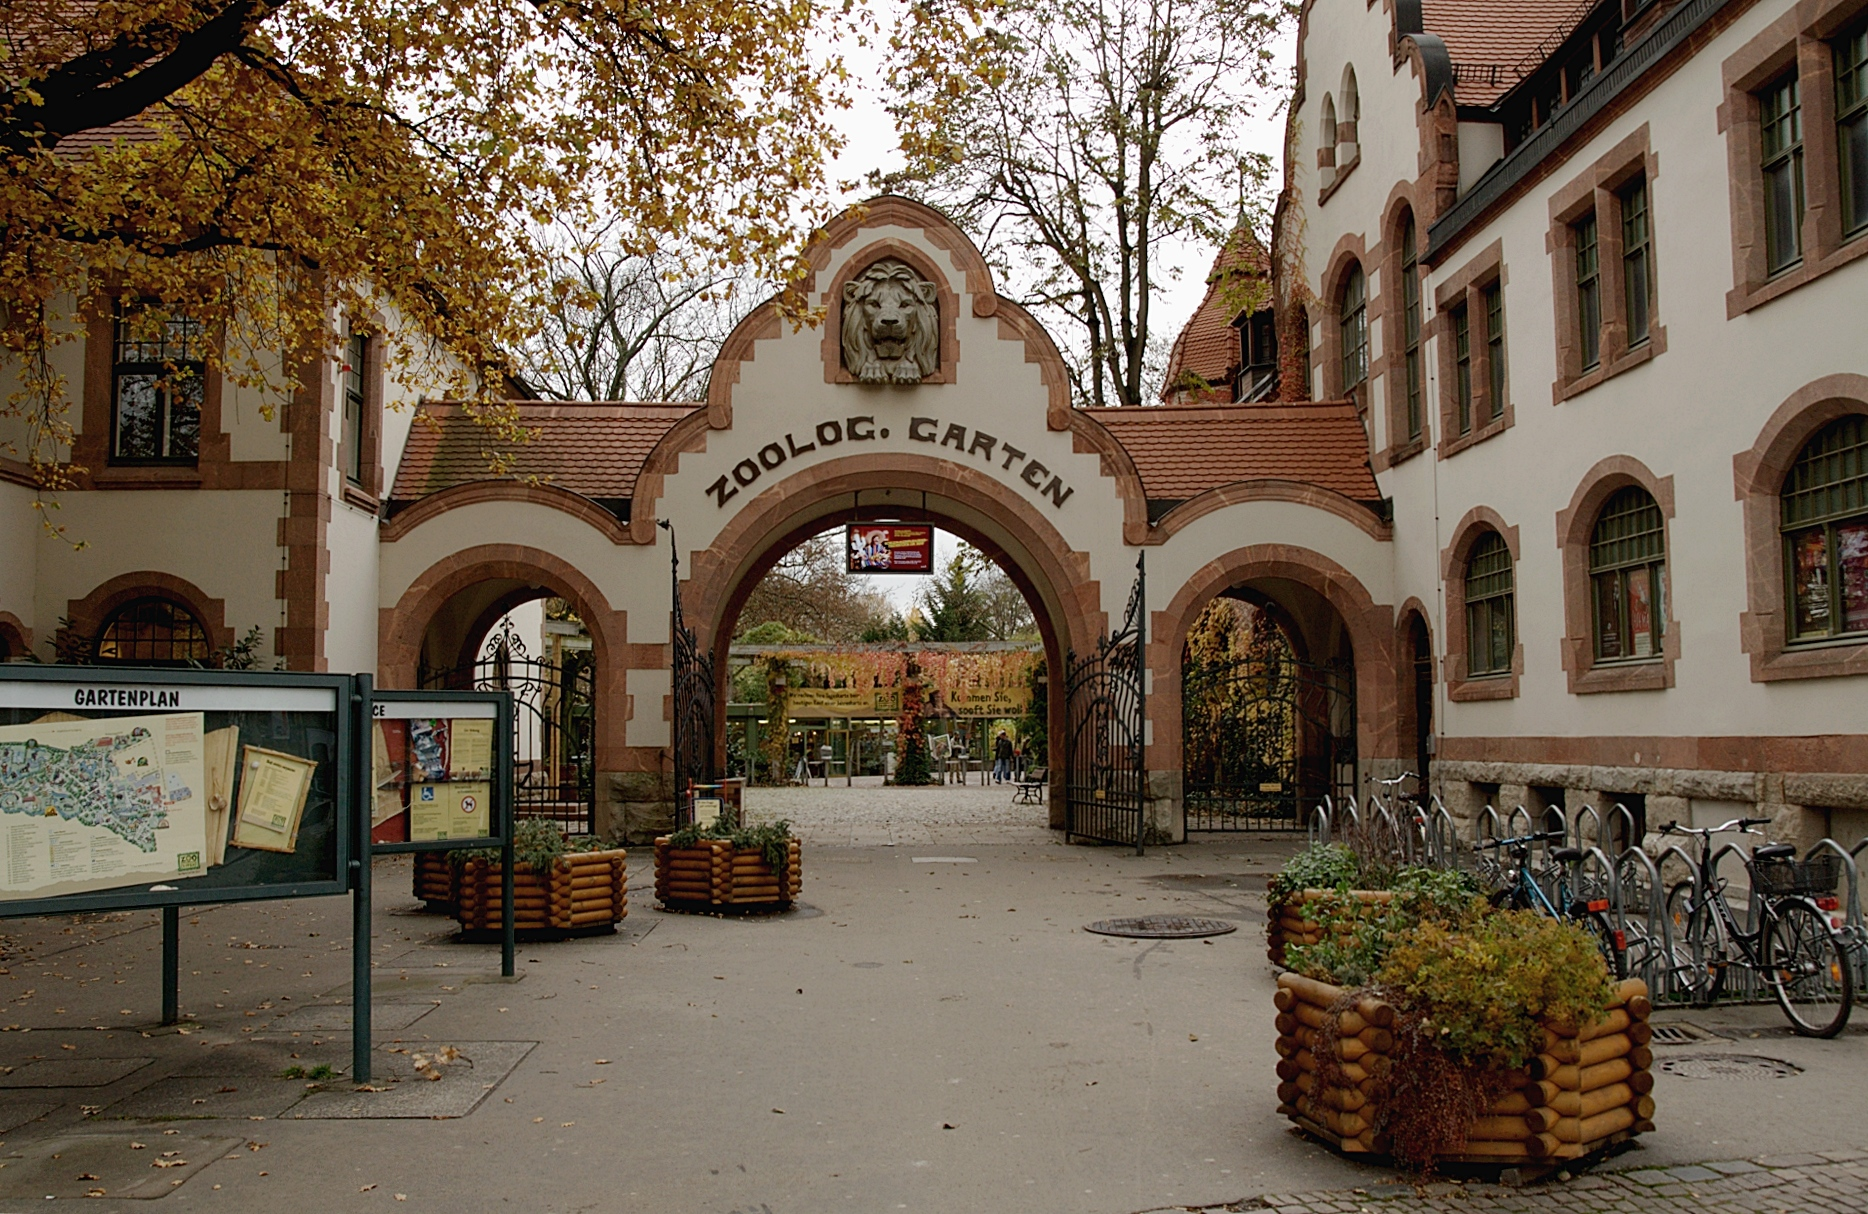 File:Eingang Zoo Leipzig.jpg - Wikimedia Commons